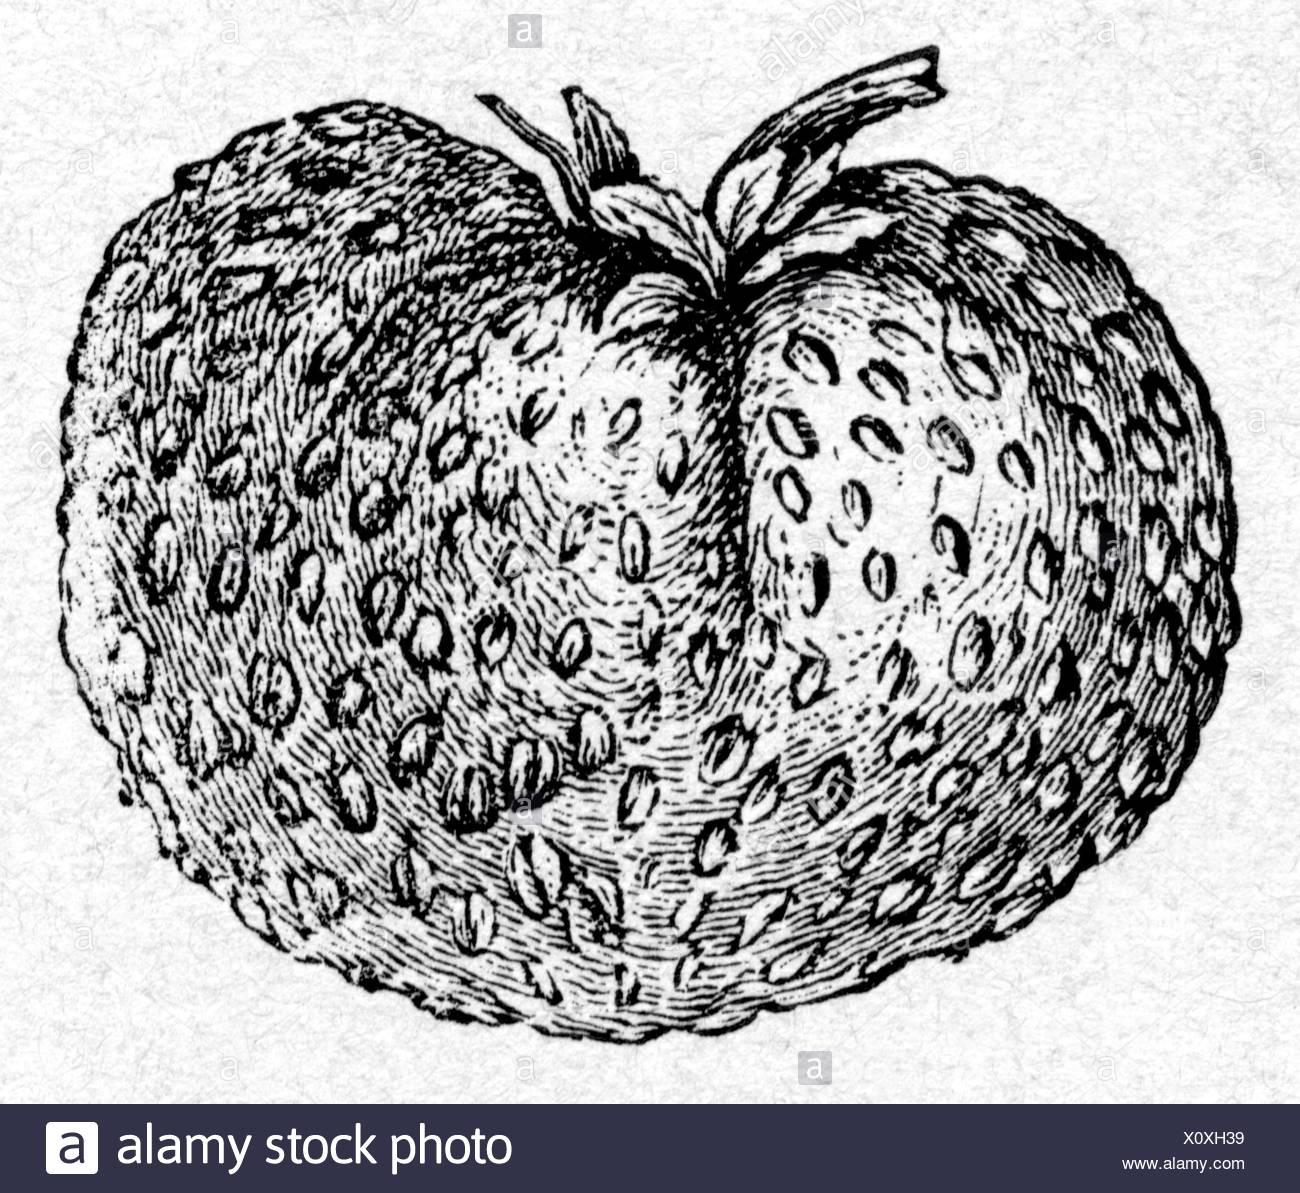 botany, Strawberry, (Fragaria), strawberry 'Komet', breeding by Gottfried Goeschke, Koethen, wood engraving, 1884, , Additional-Rights-Clearances-NA - Stock Image